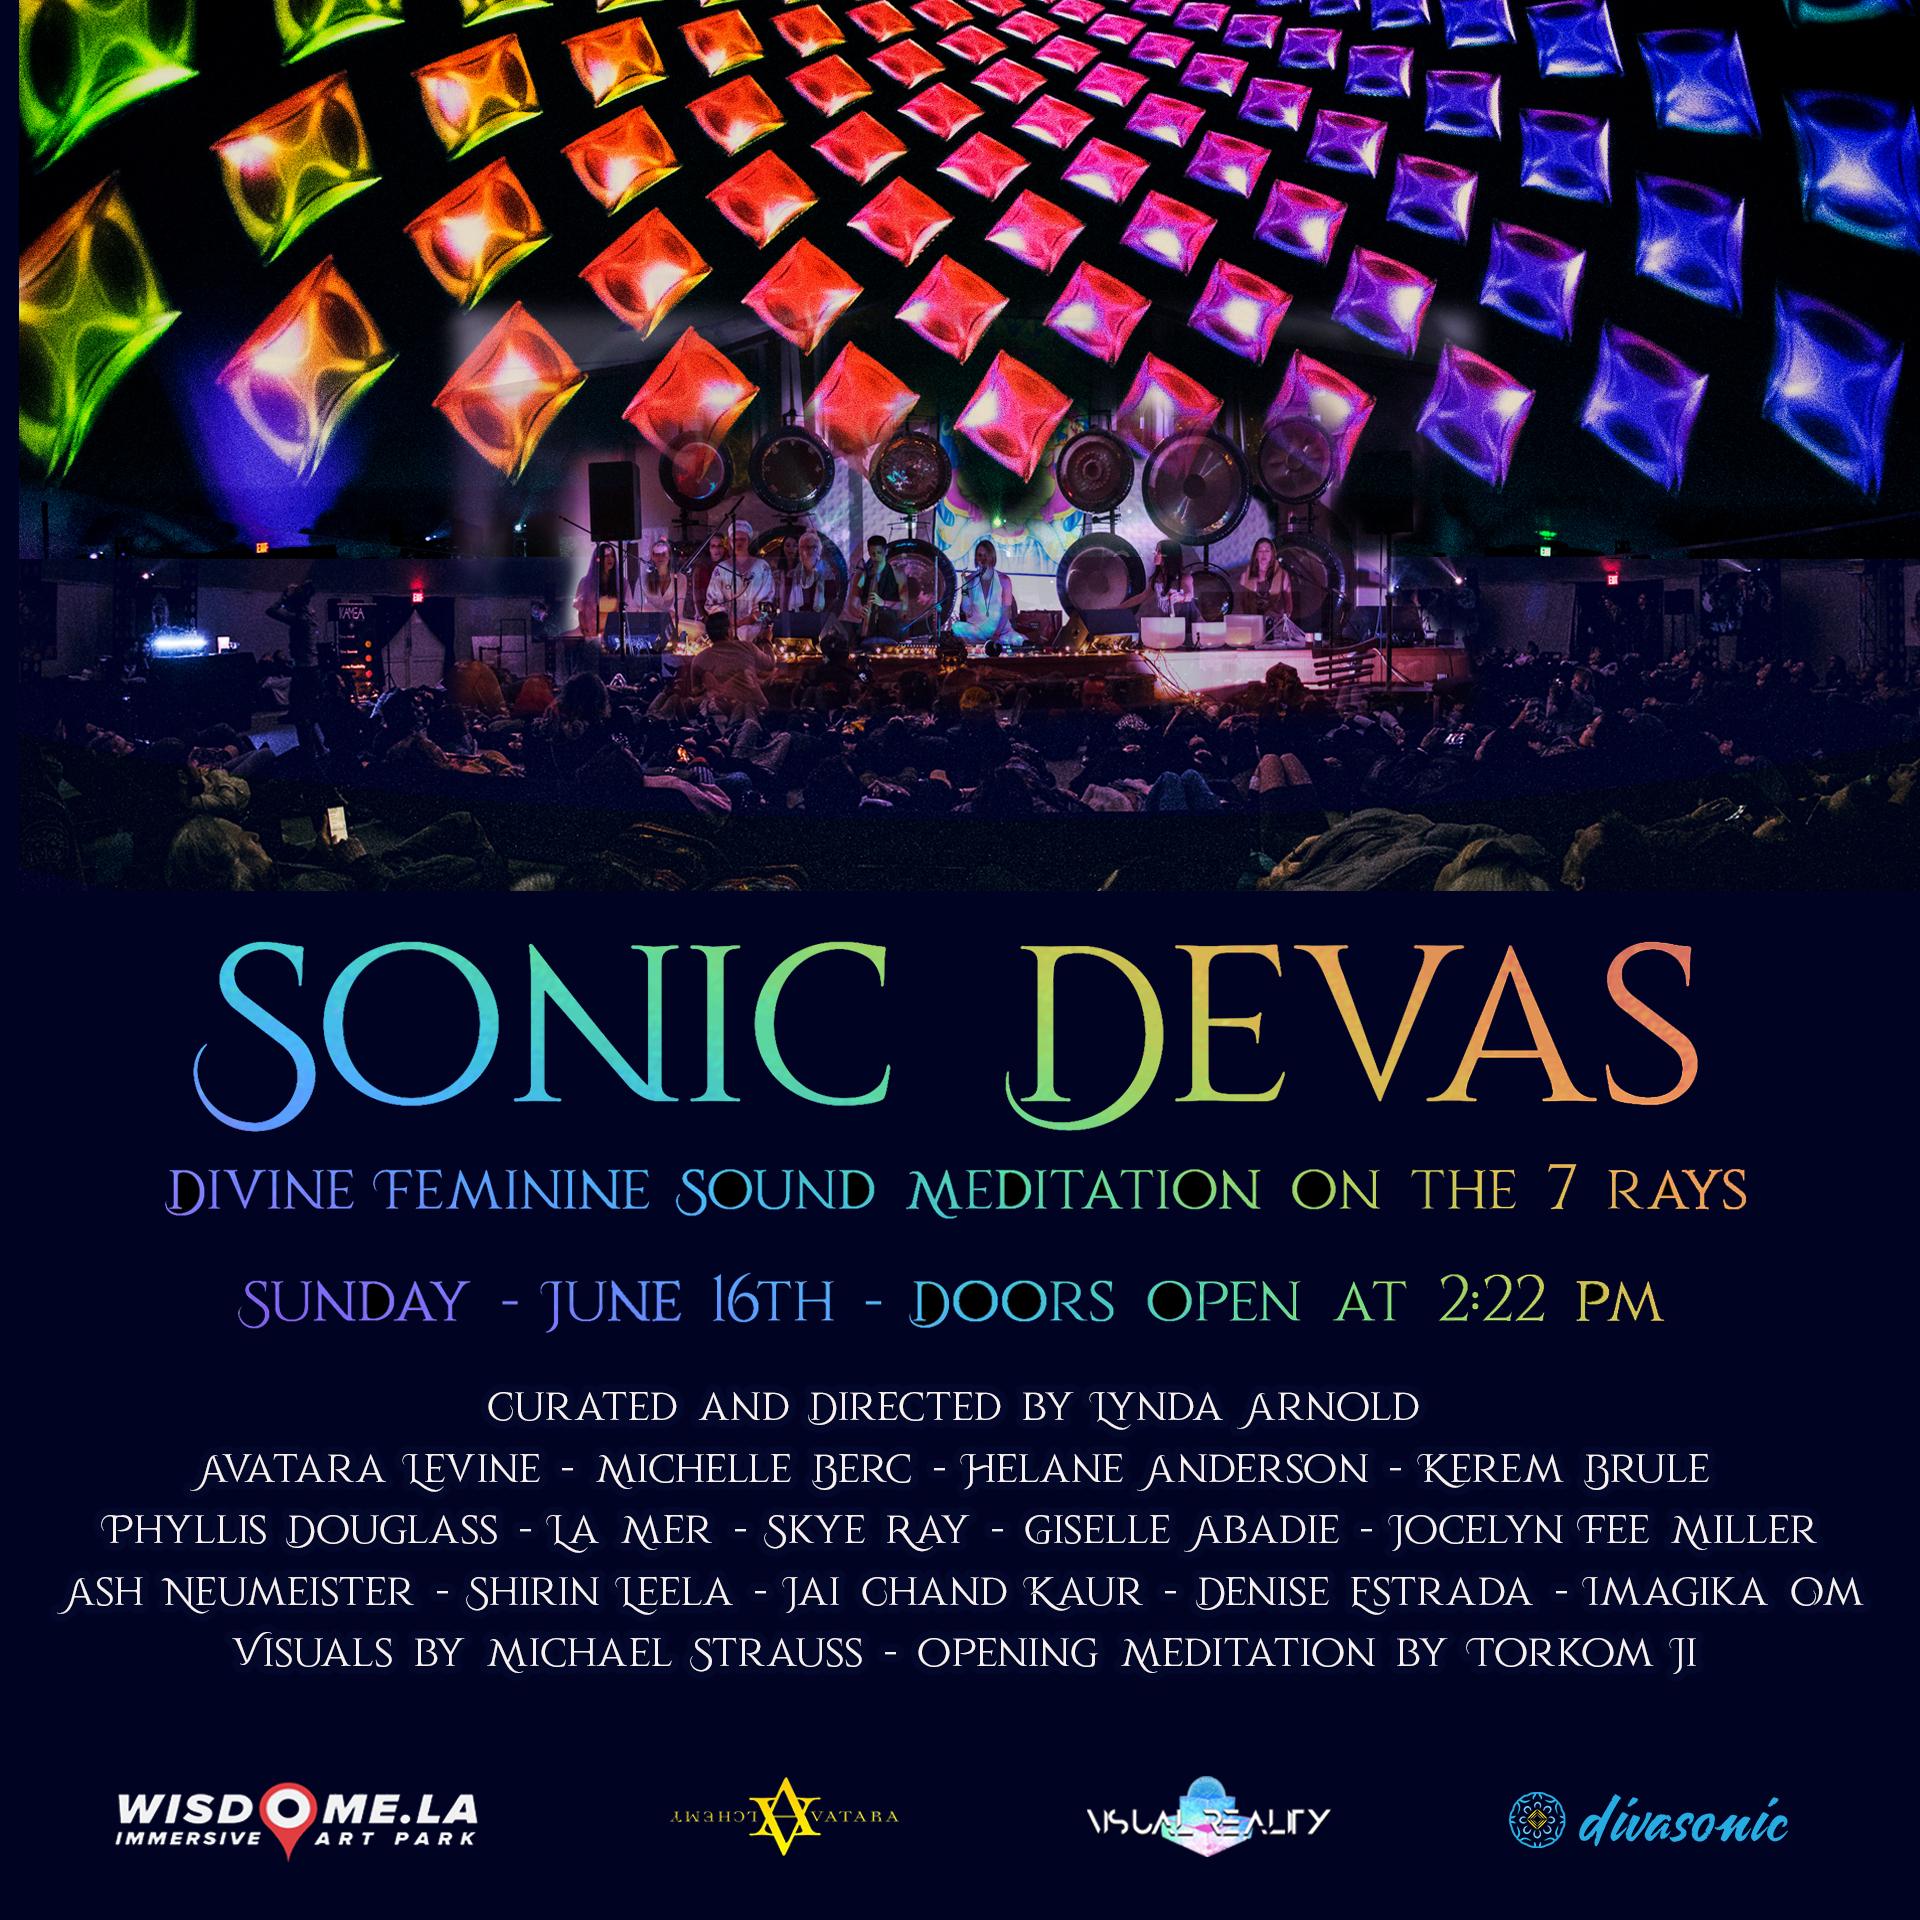 Sonic_Devas_SQ_Wisdome_June2019.jpg